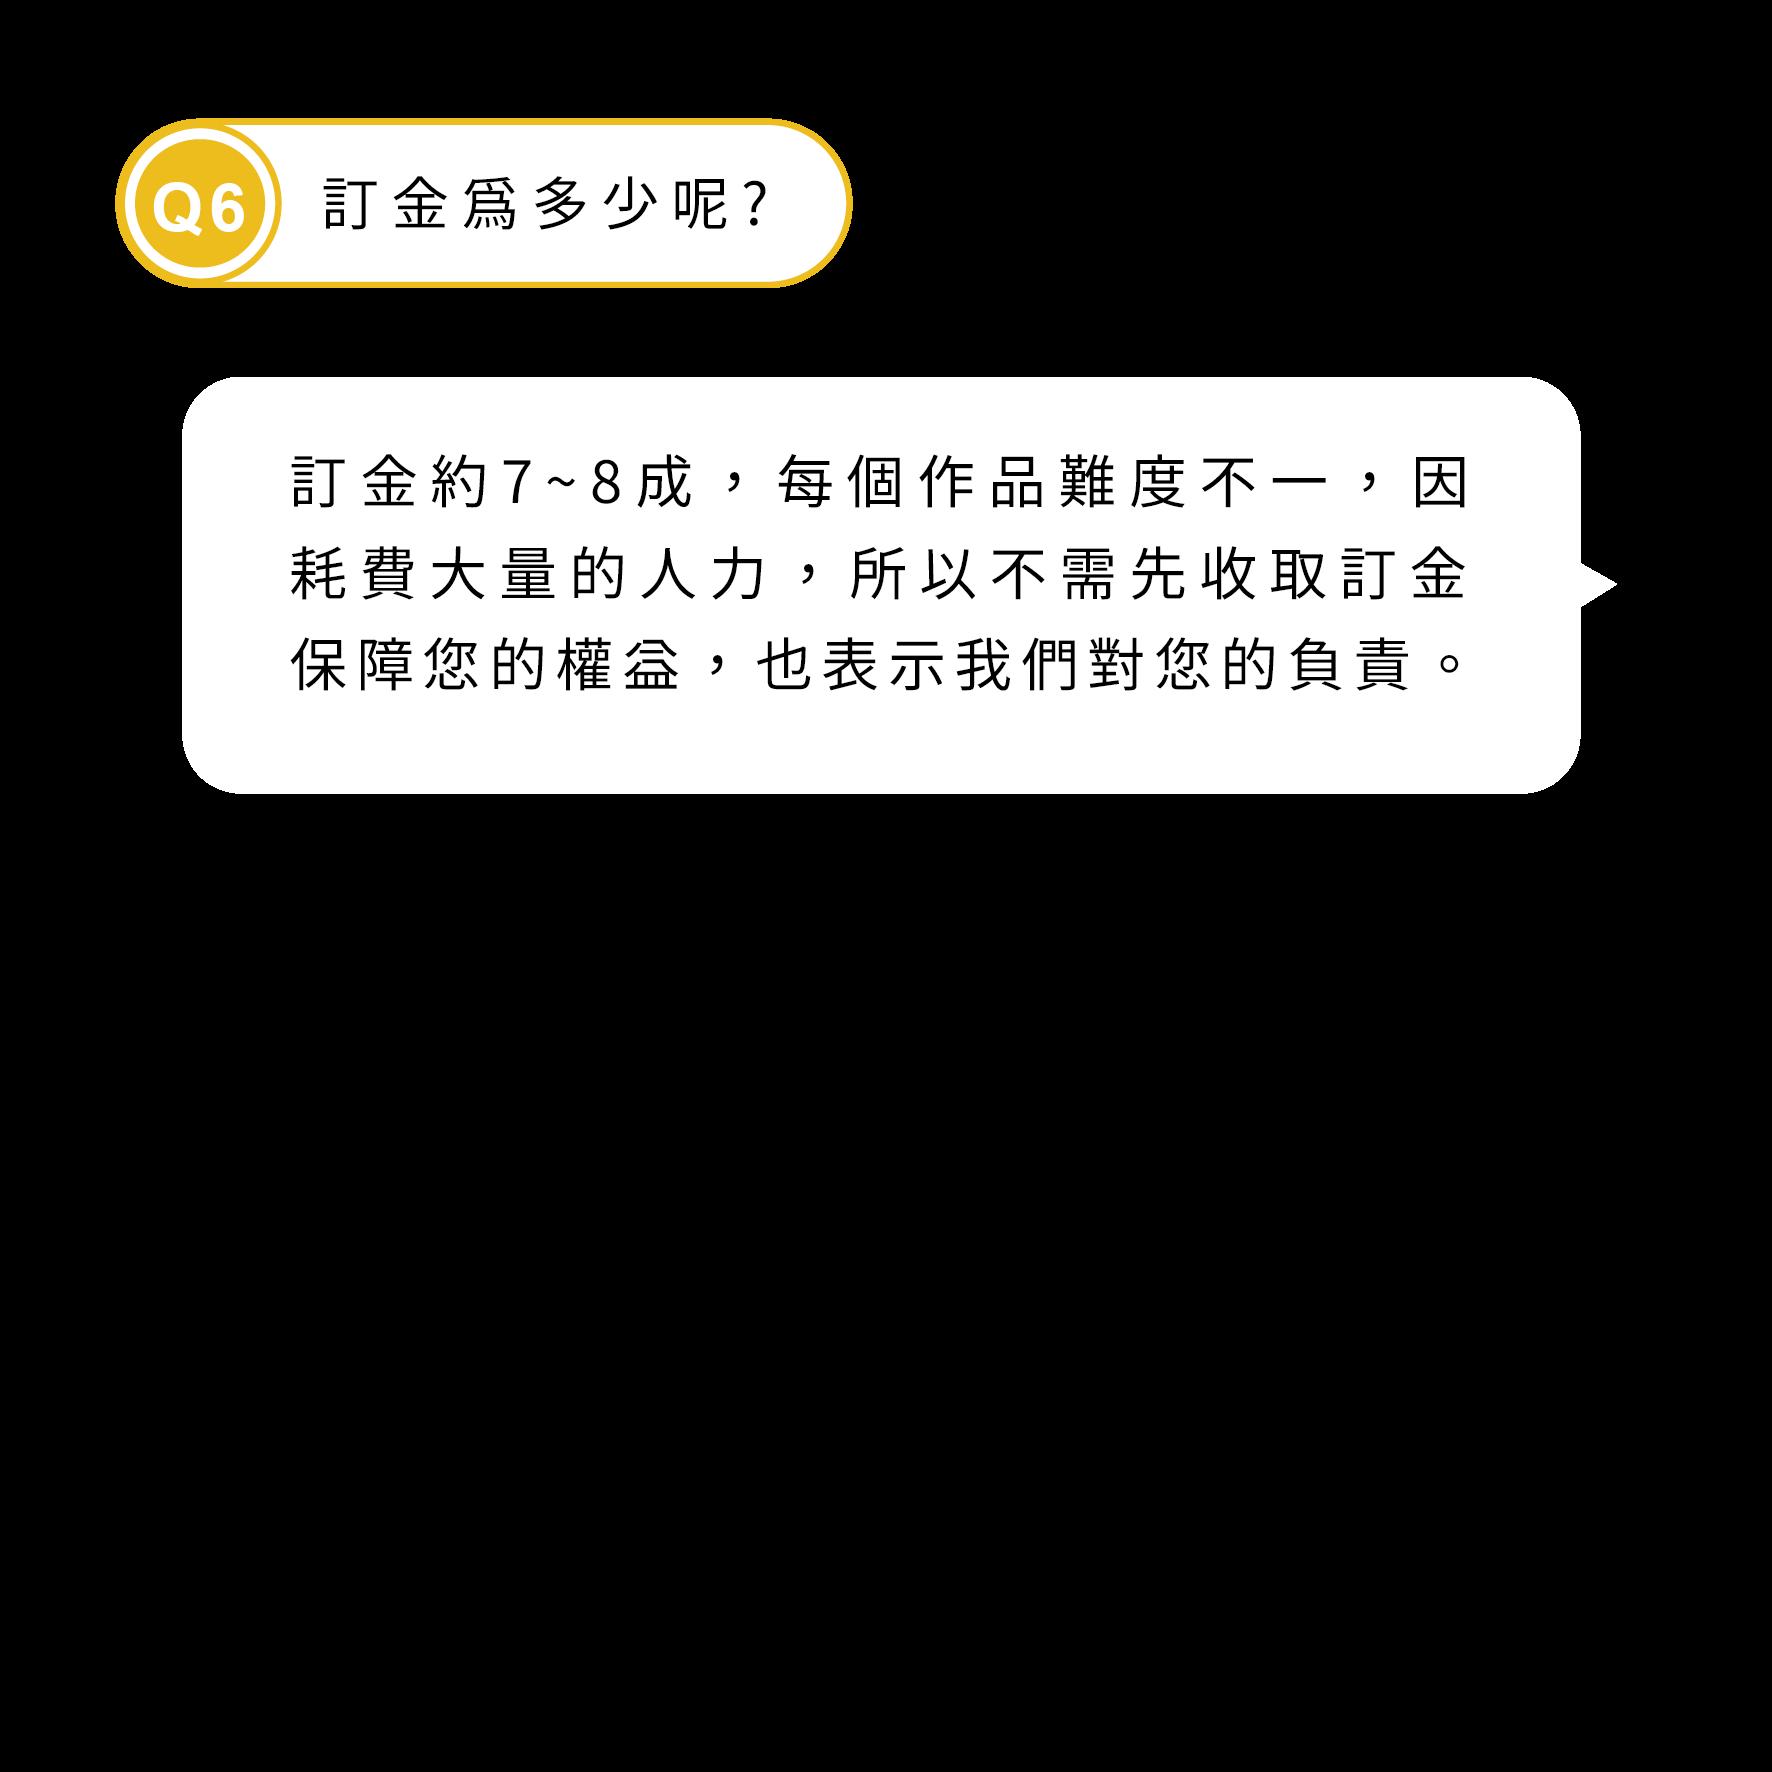 Q6 (1)